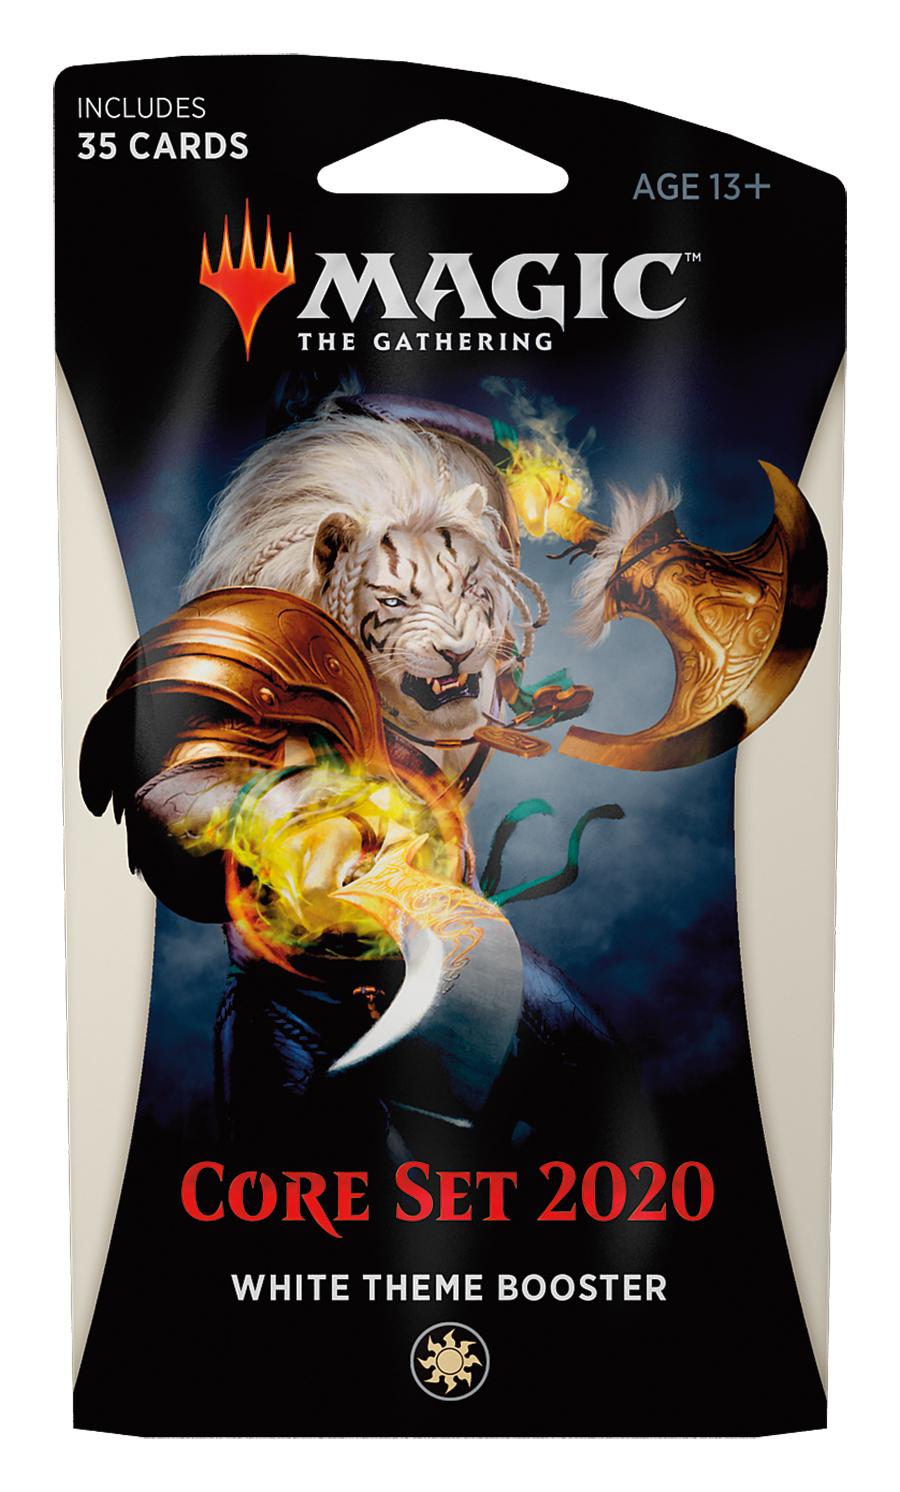 Magic The Gathering: Core Set 2020 White Theme Booster image